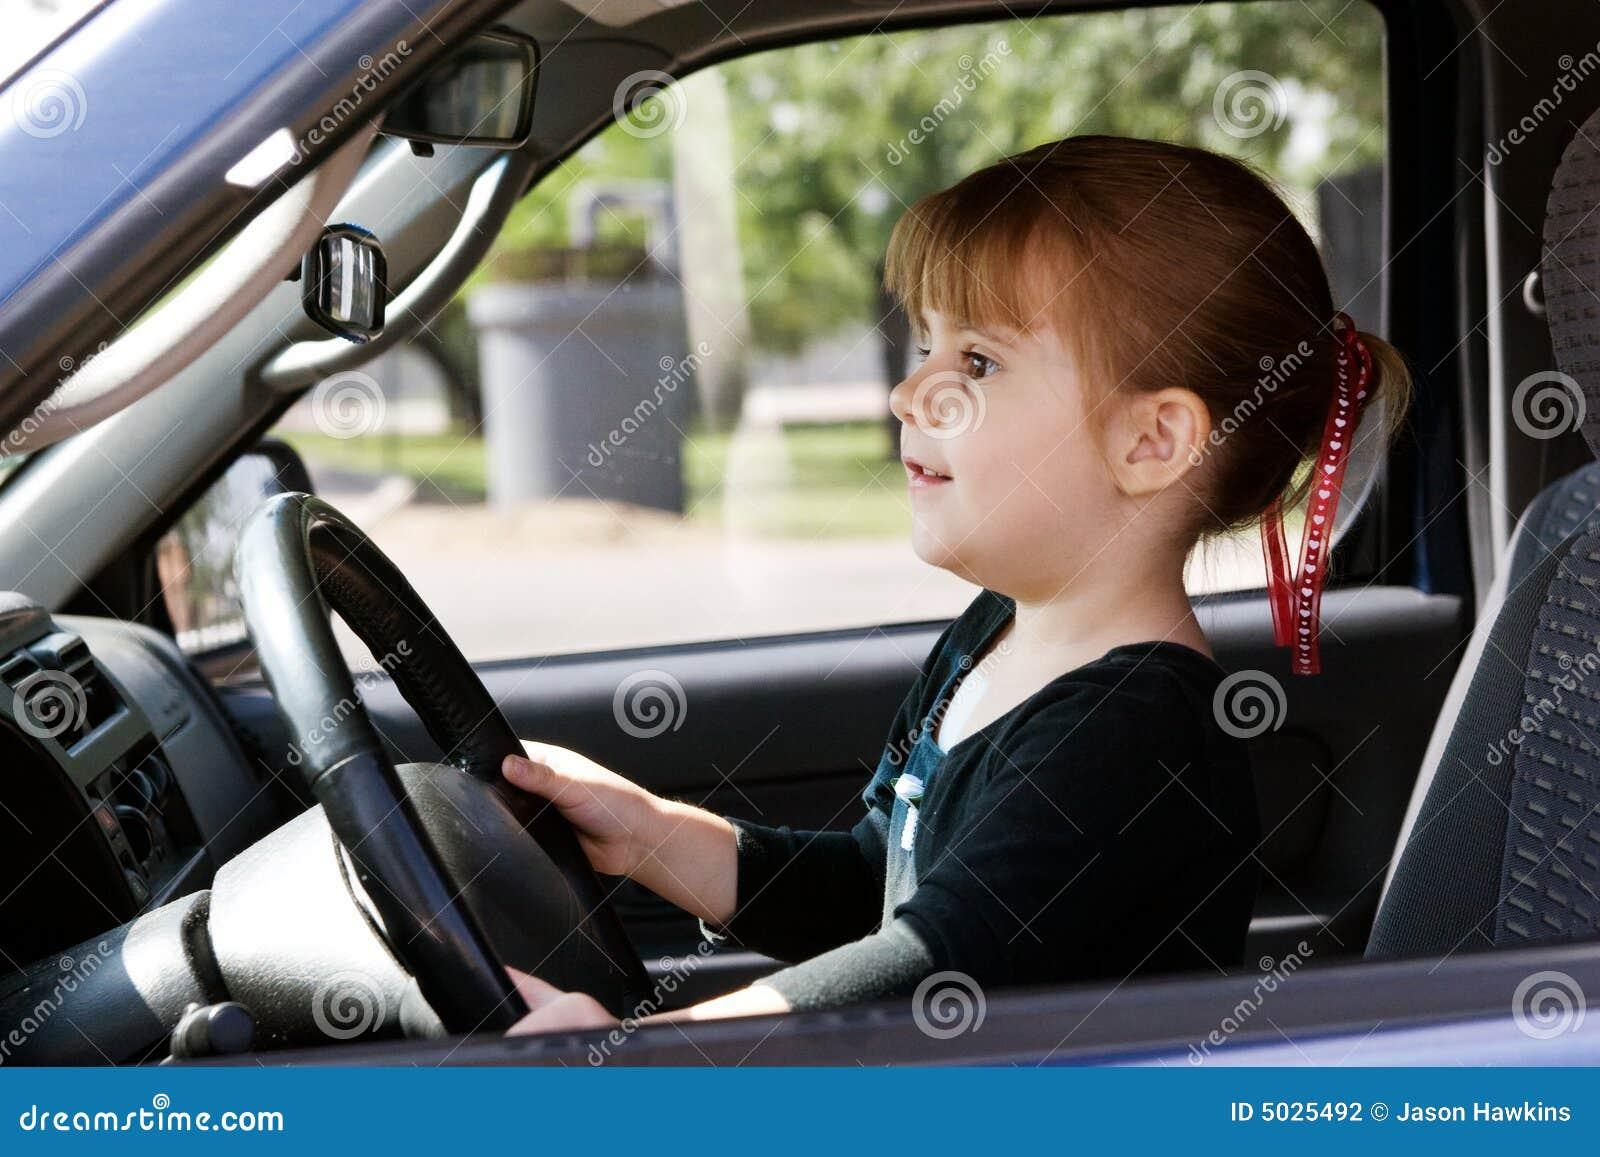 Drive Lyrics Cars: A Girl Driving A Car Stock Photography